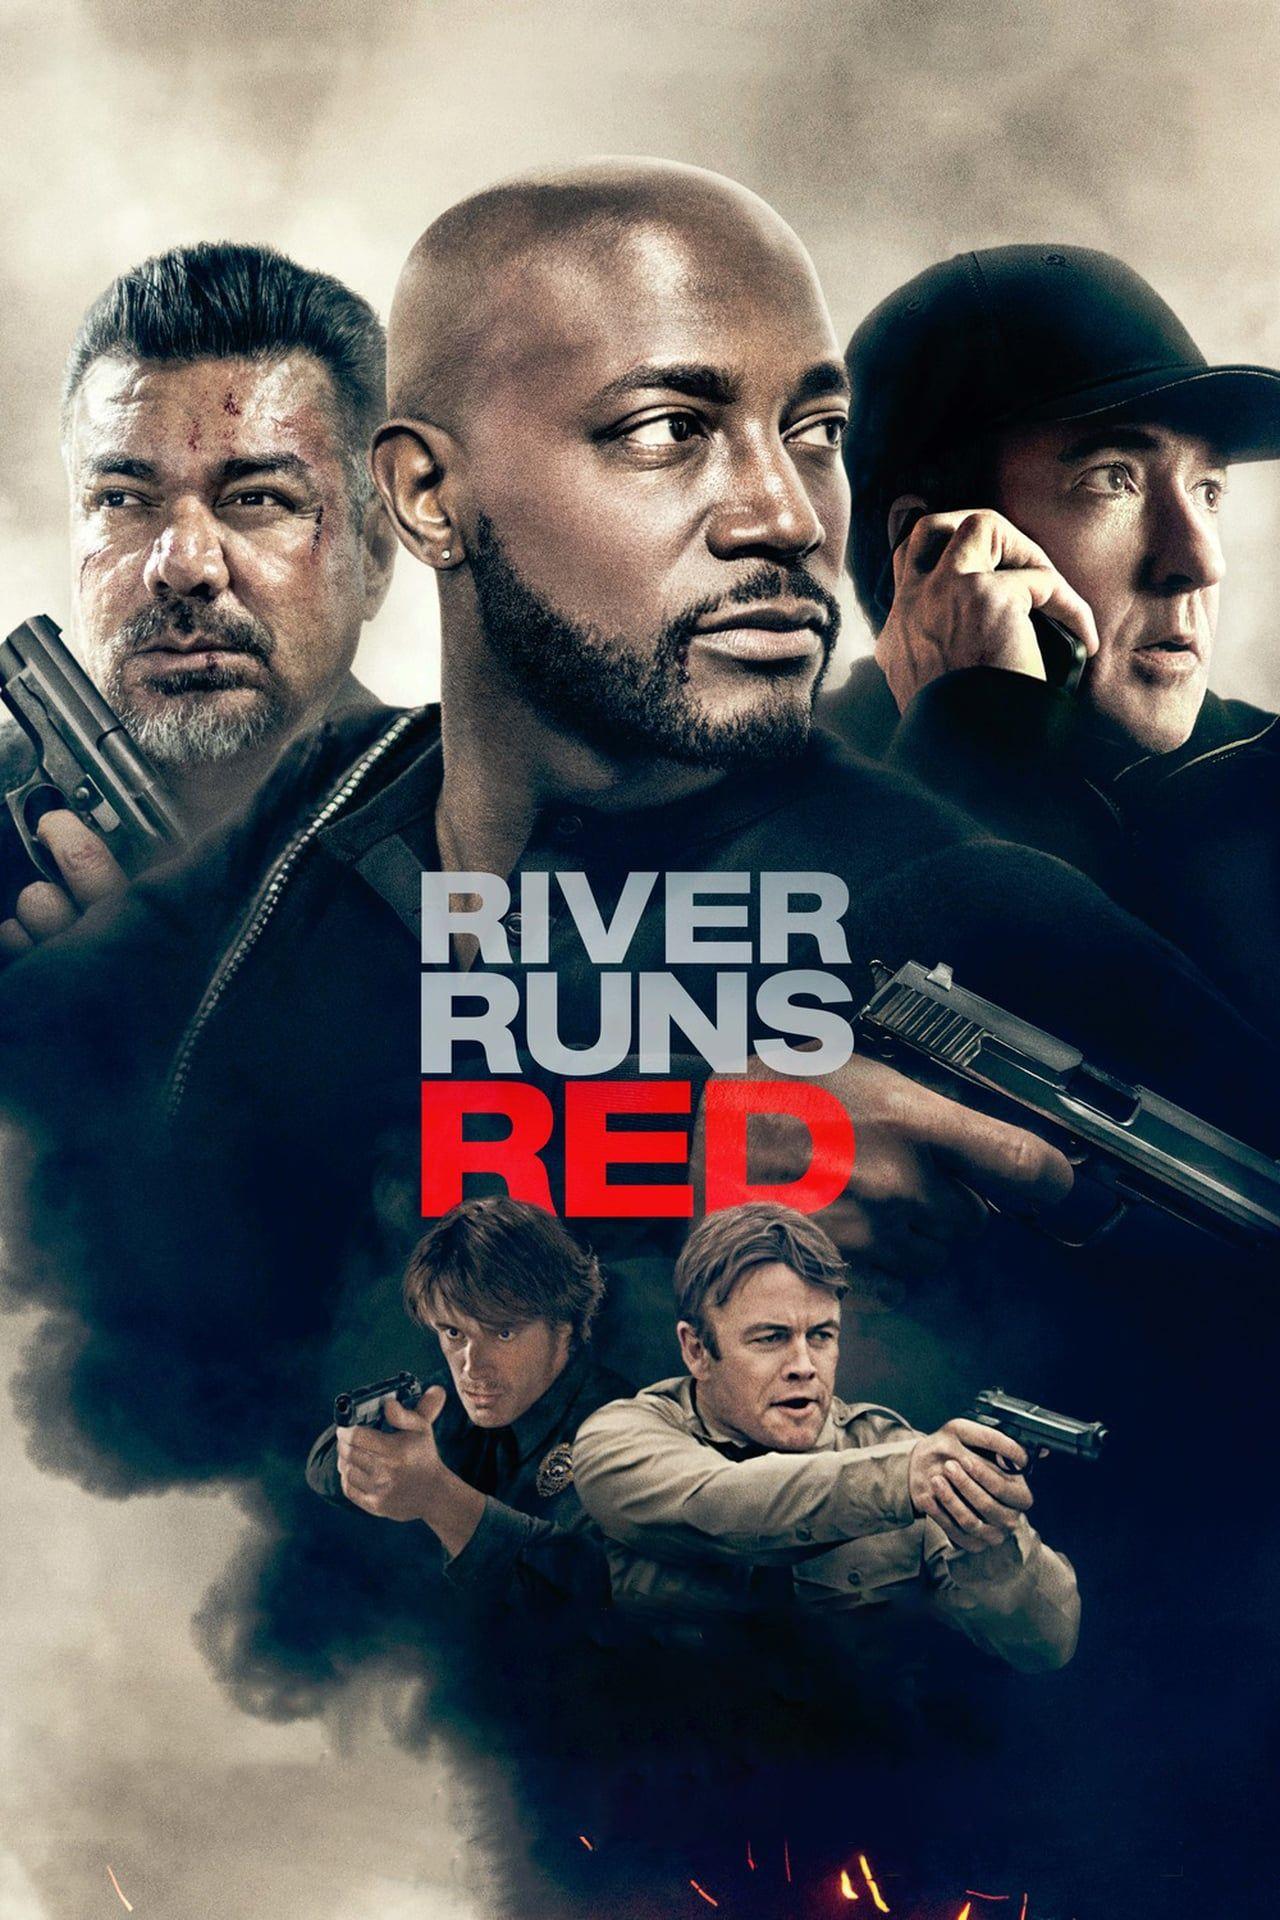 Ver Hd Online River Runs Red P E L I C U L A Completa Espanol